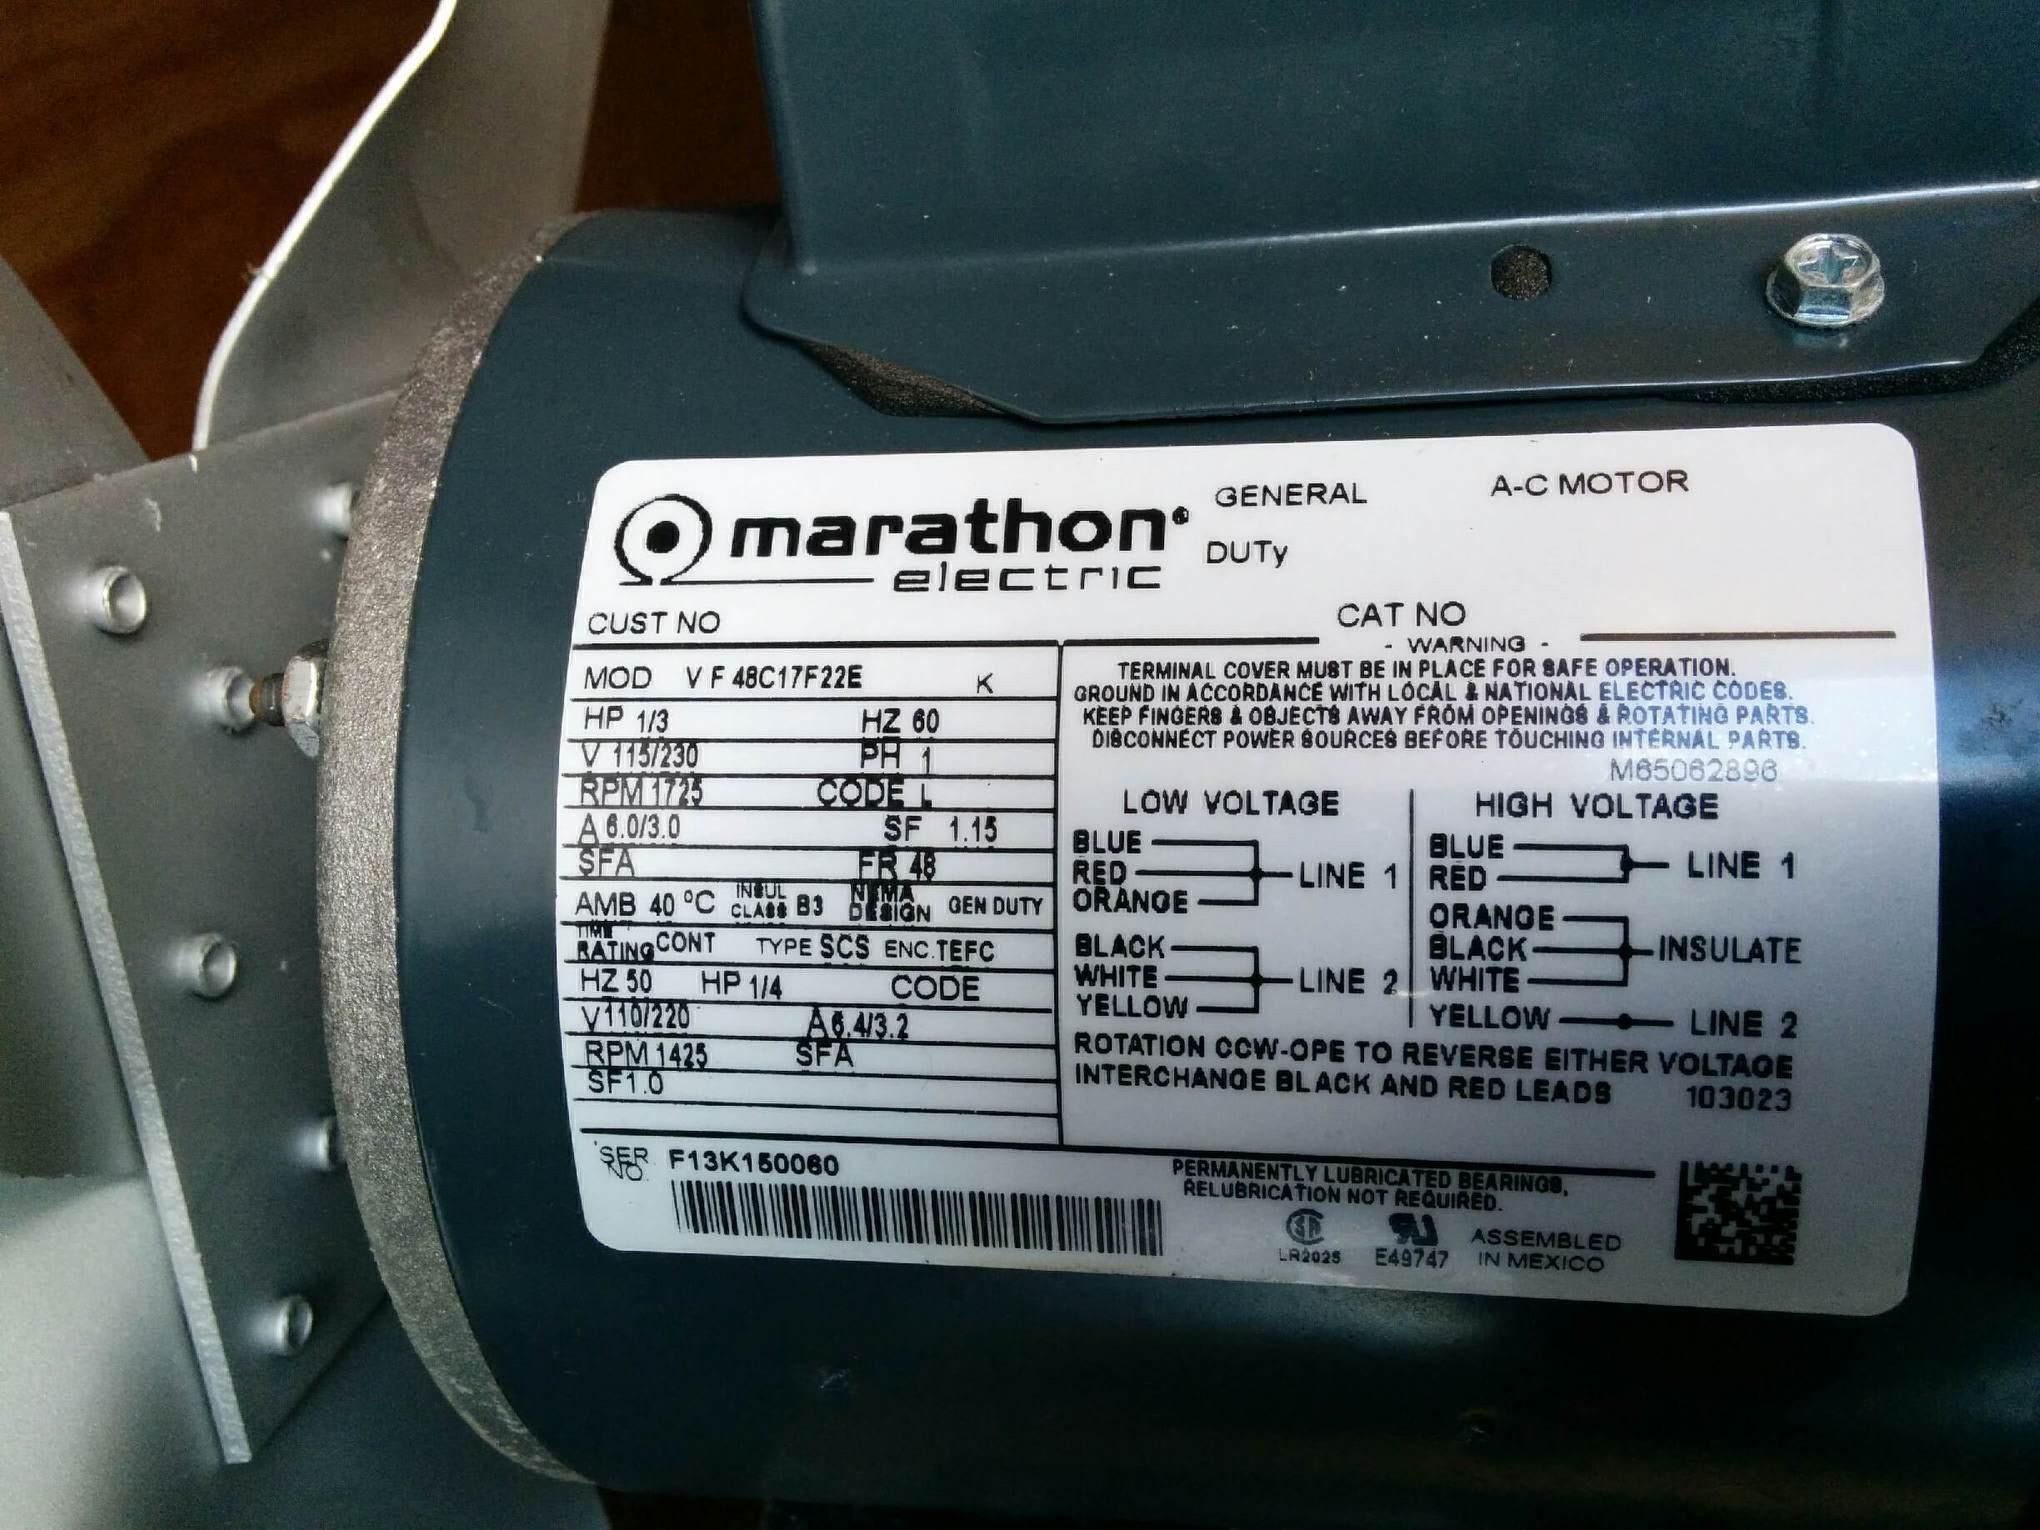 Marathon Electric Pump Wiring Diagram Explained Diagrams Century Wire Motor Pool Motors